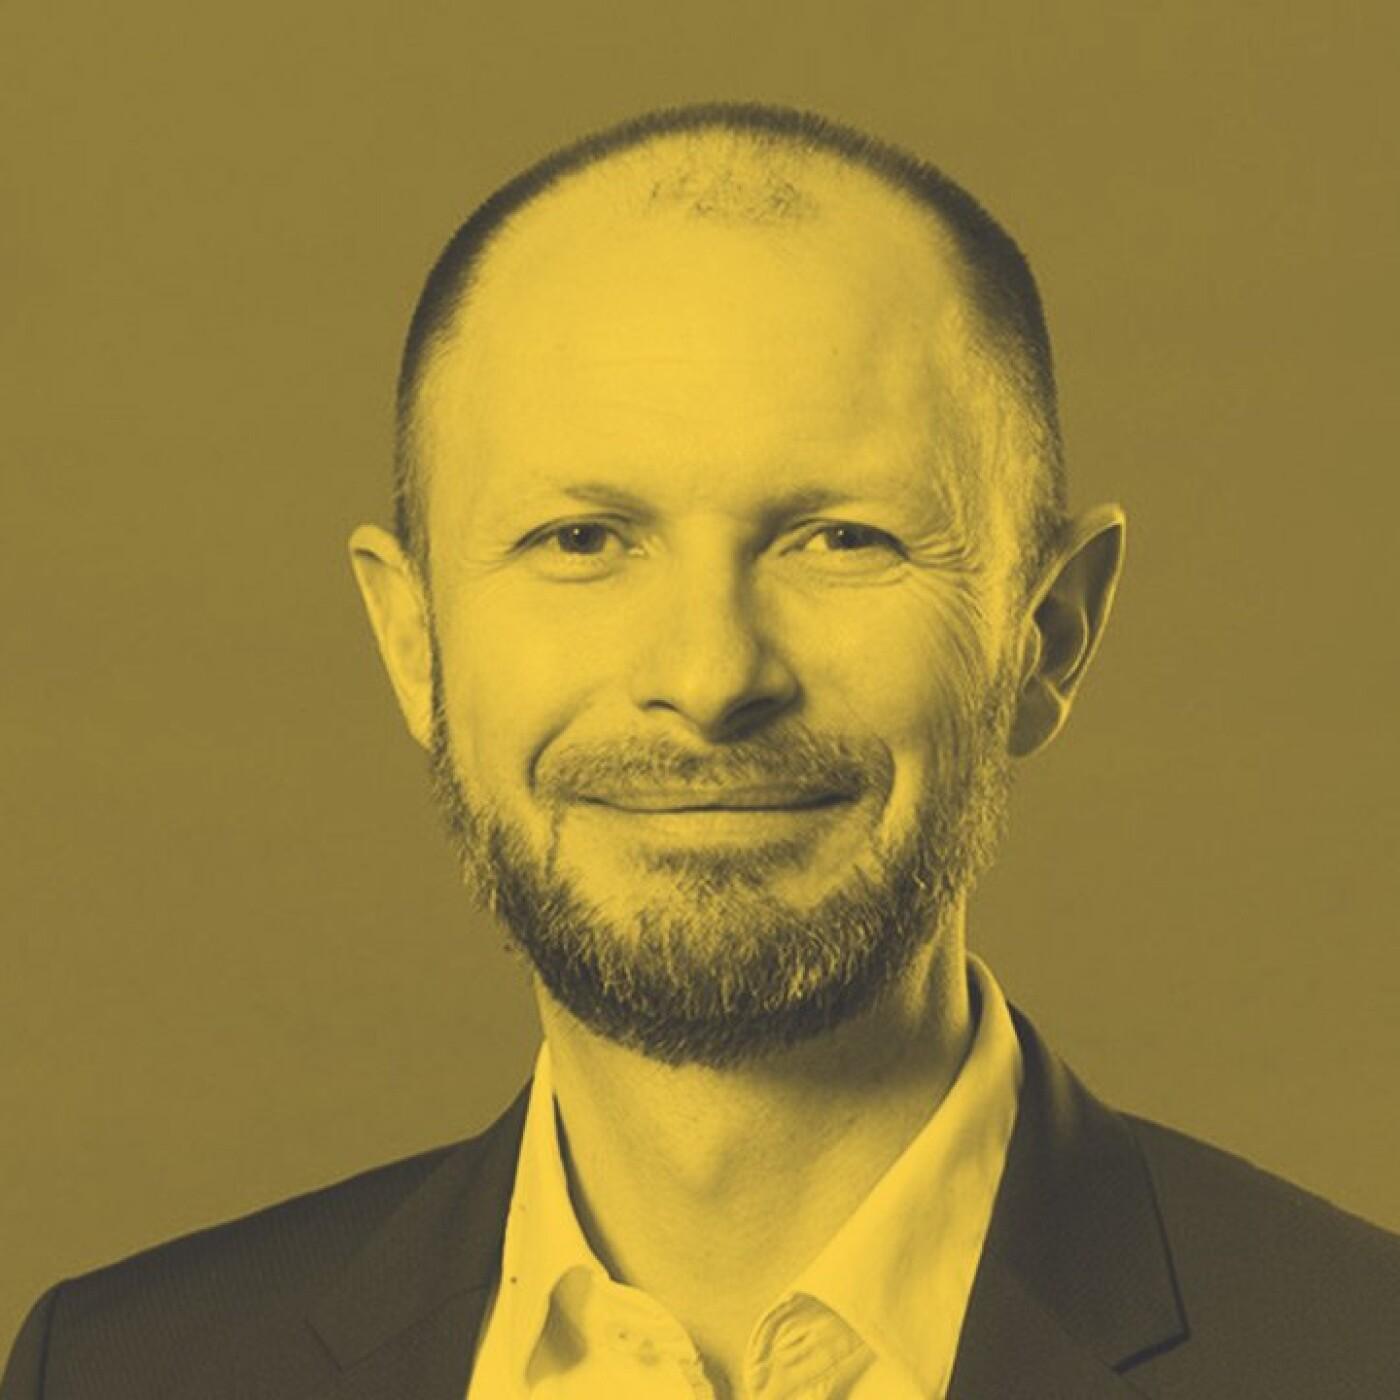 #32 - Frédéric Vallet, Président de DB Schenker France